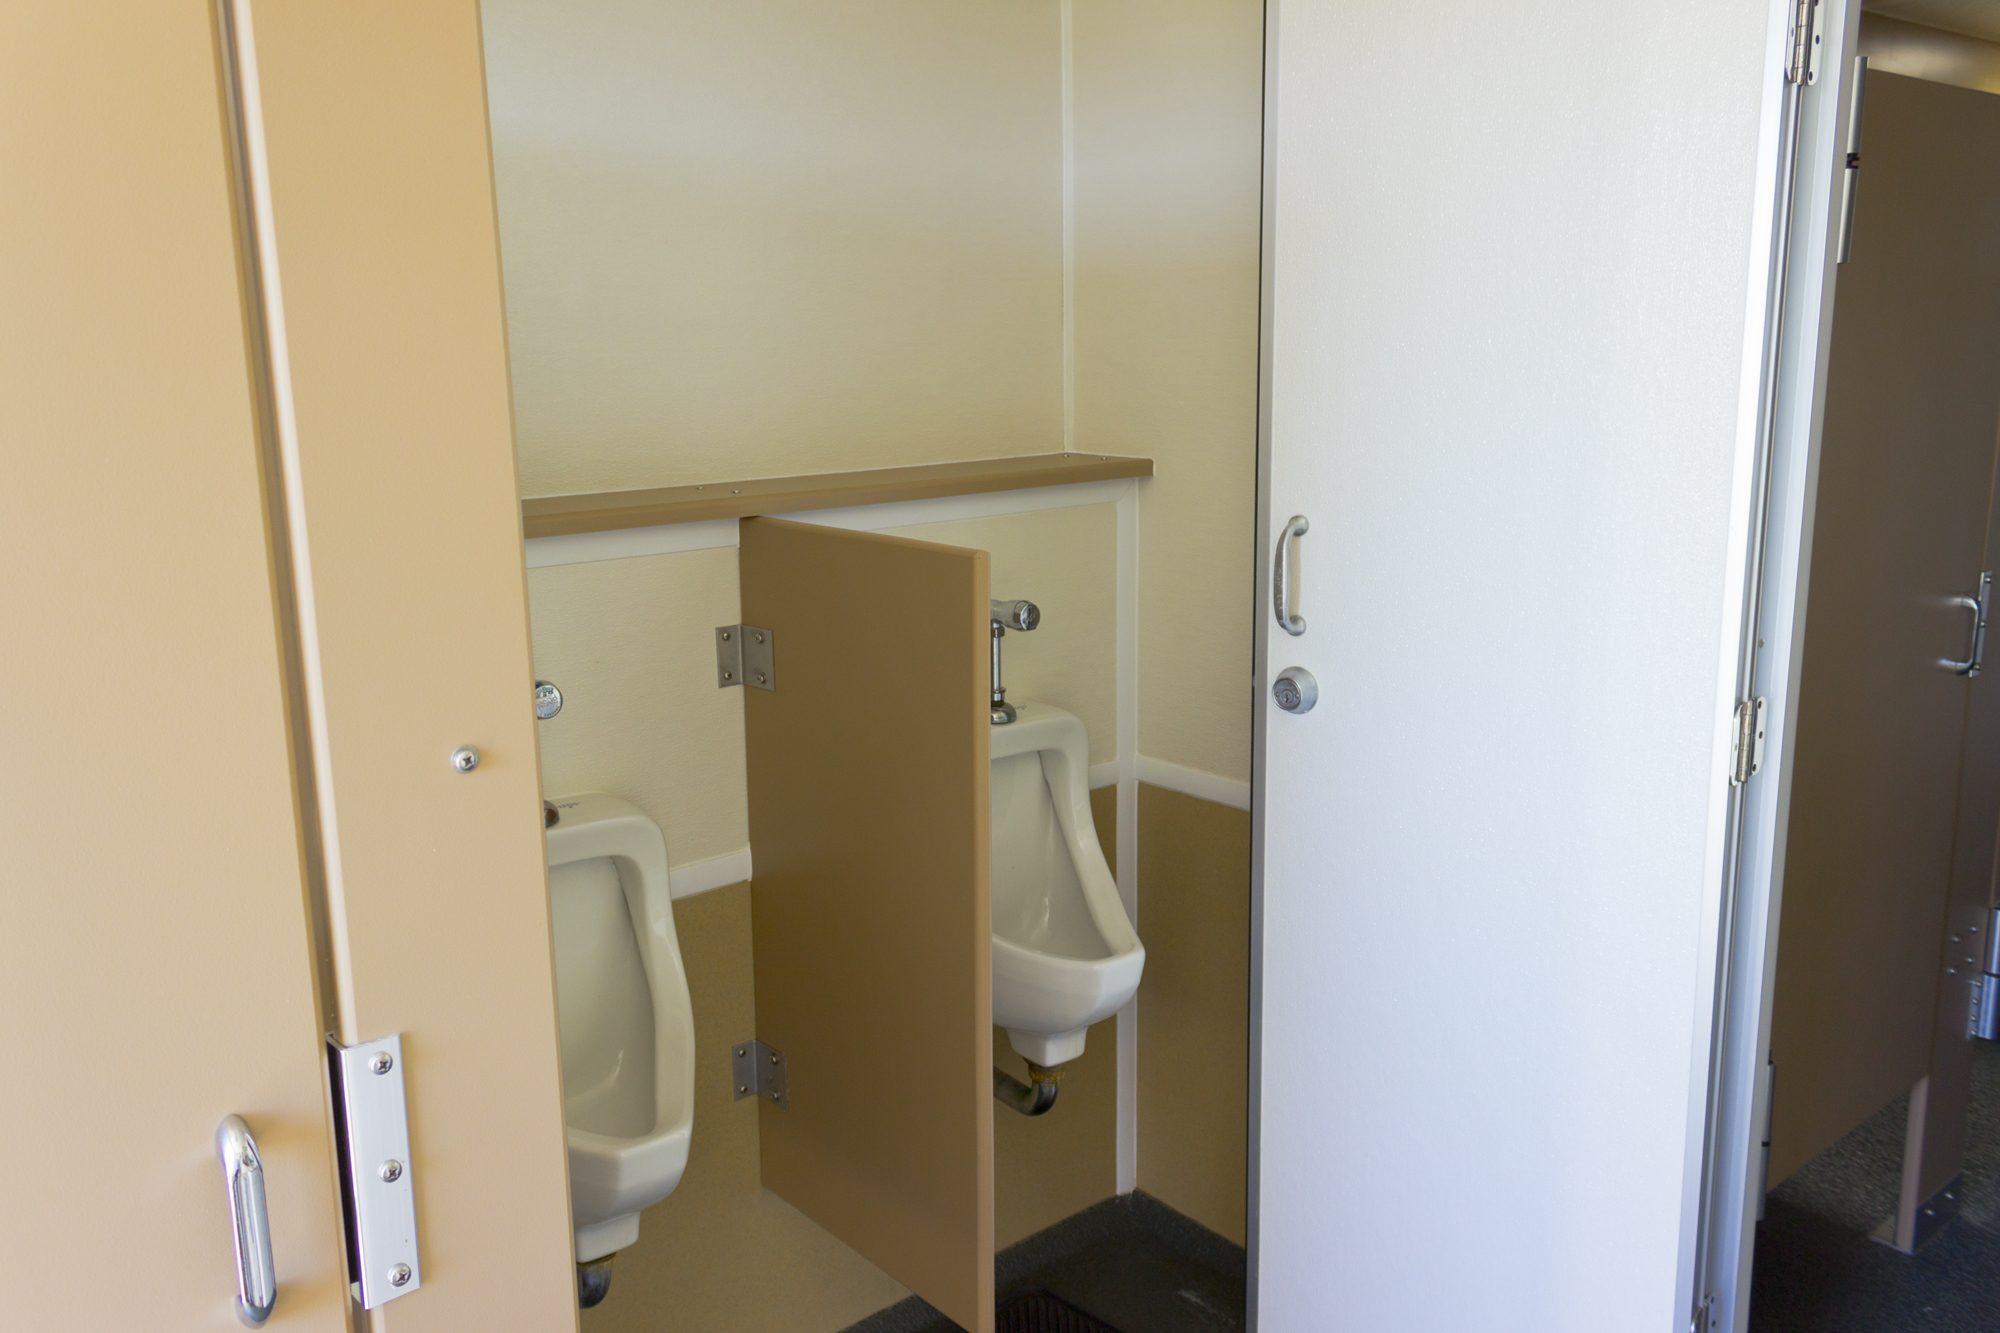 VIP restroom trailer inside 2